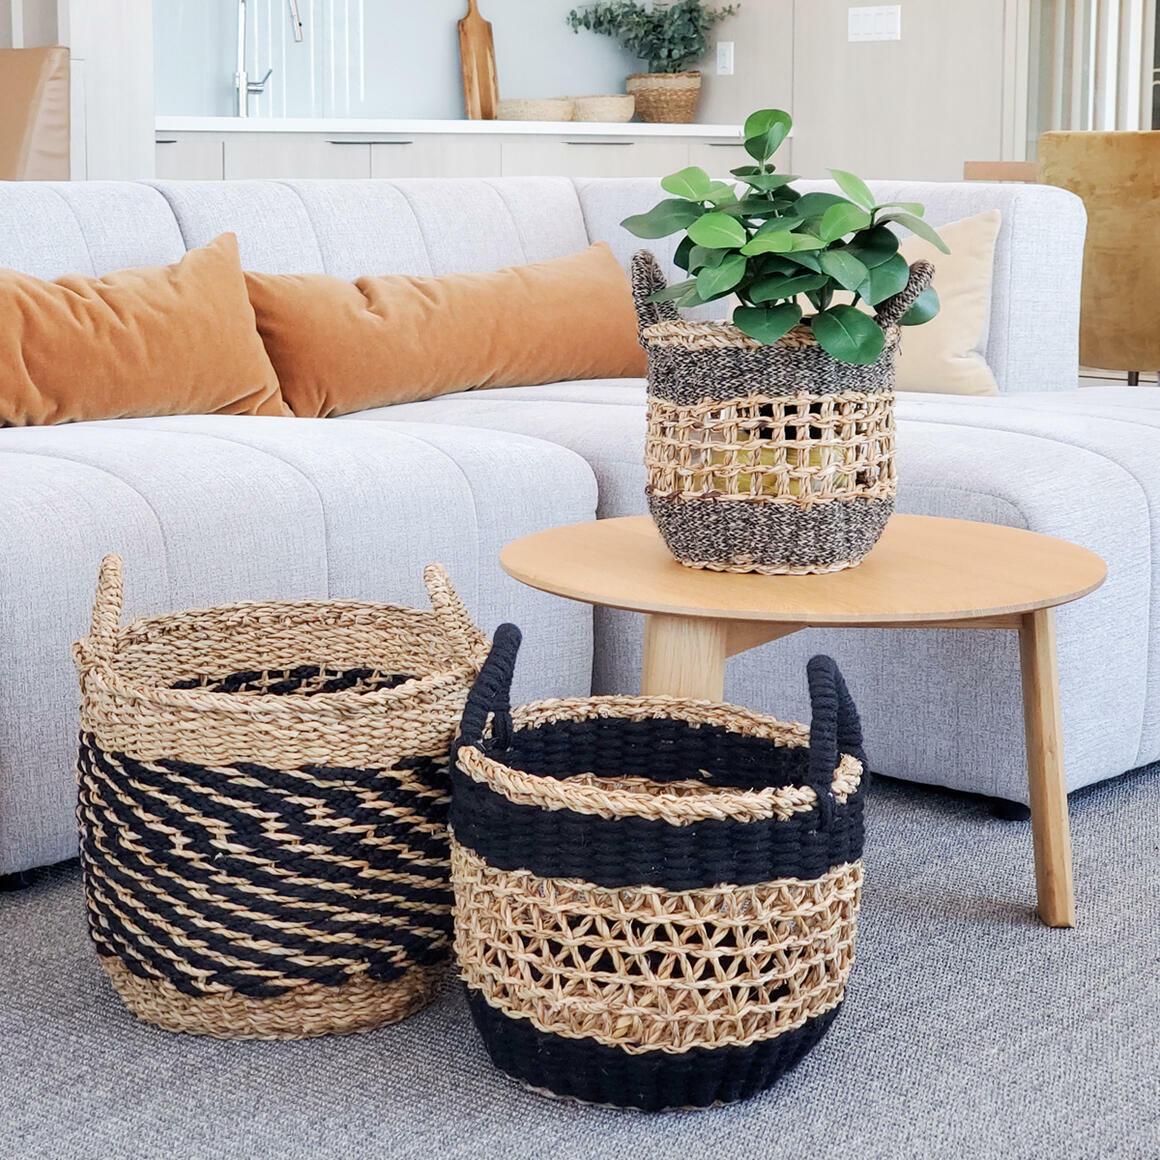 Ula Mesh Basket - Black (Set of 3) | Trada Marketplace